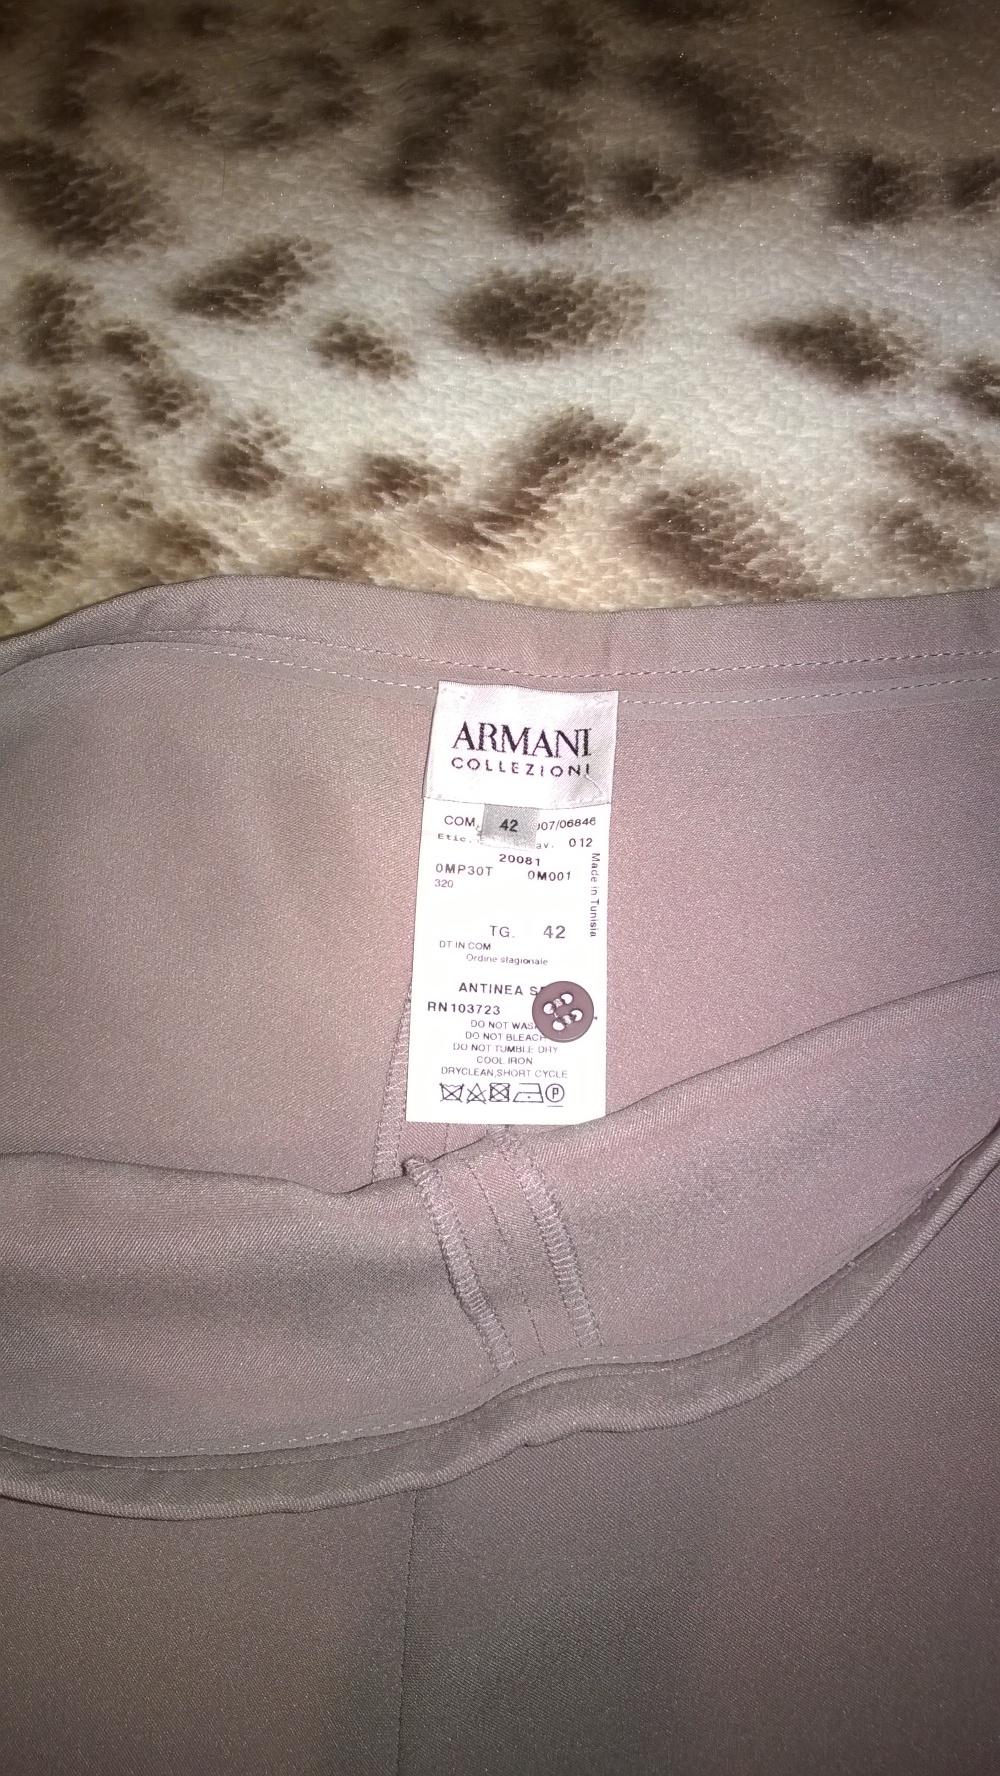 Новые брюки Armani Collezioni 42it